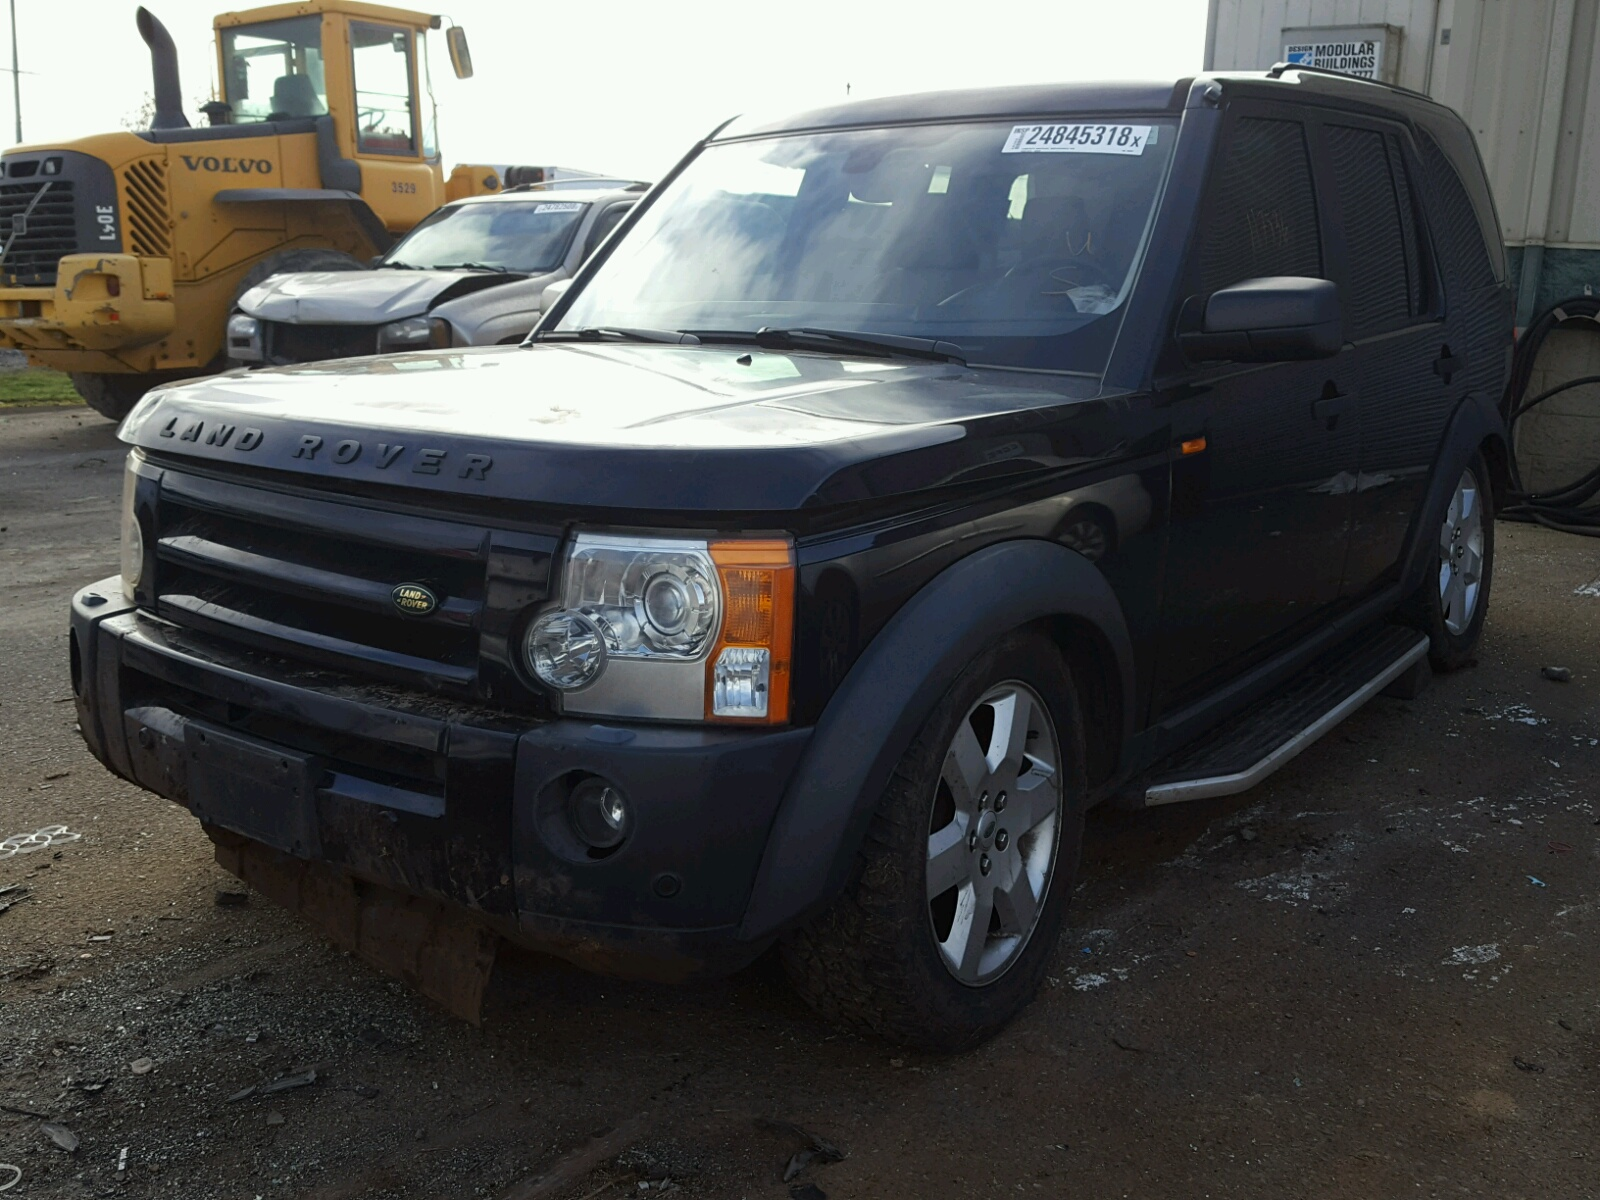 in rover for auctions carfinder se right rebuilt landrover of lot copart auto sale title mcallen en tx black cert view online on land